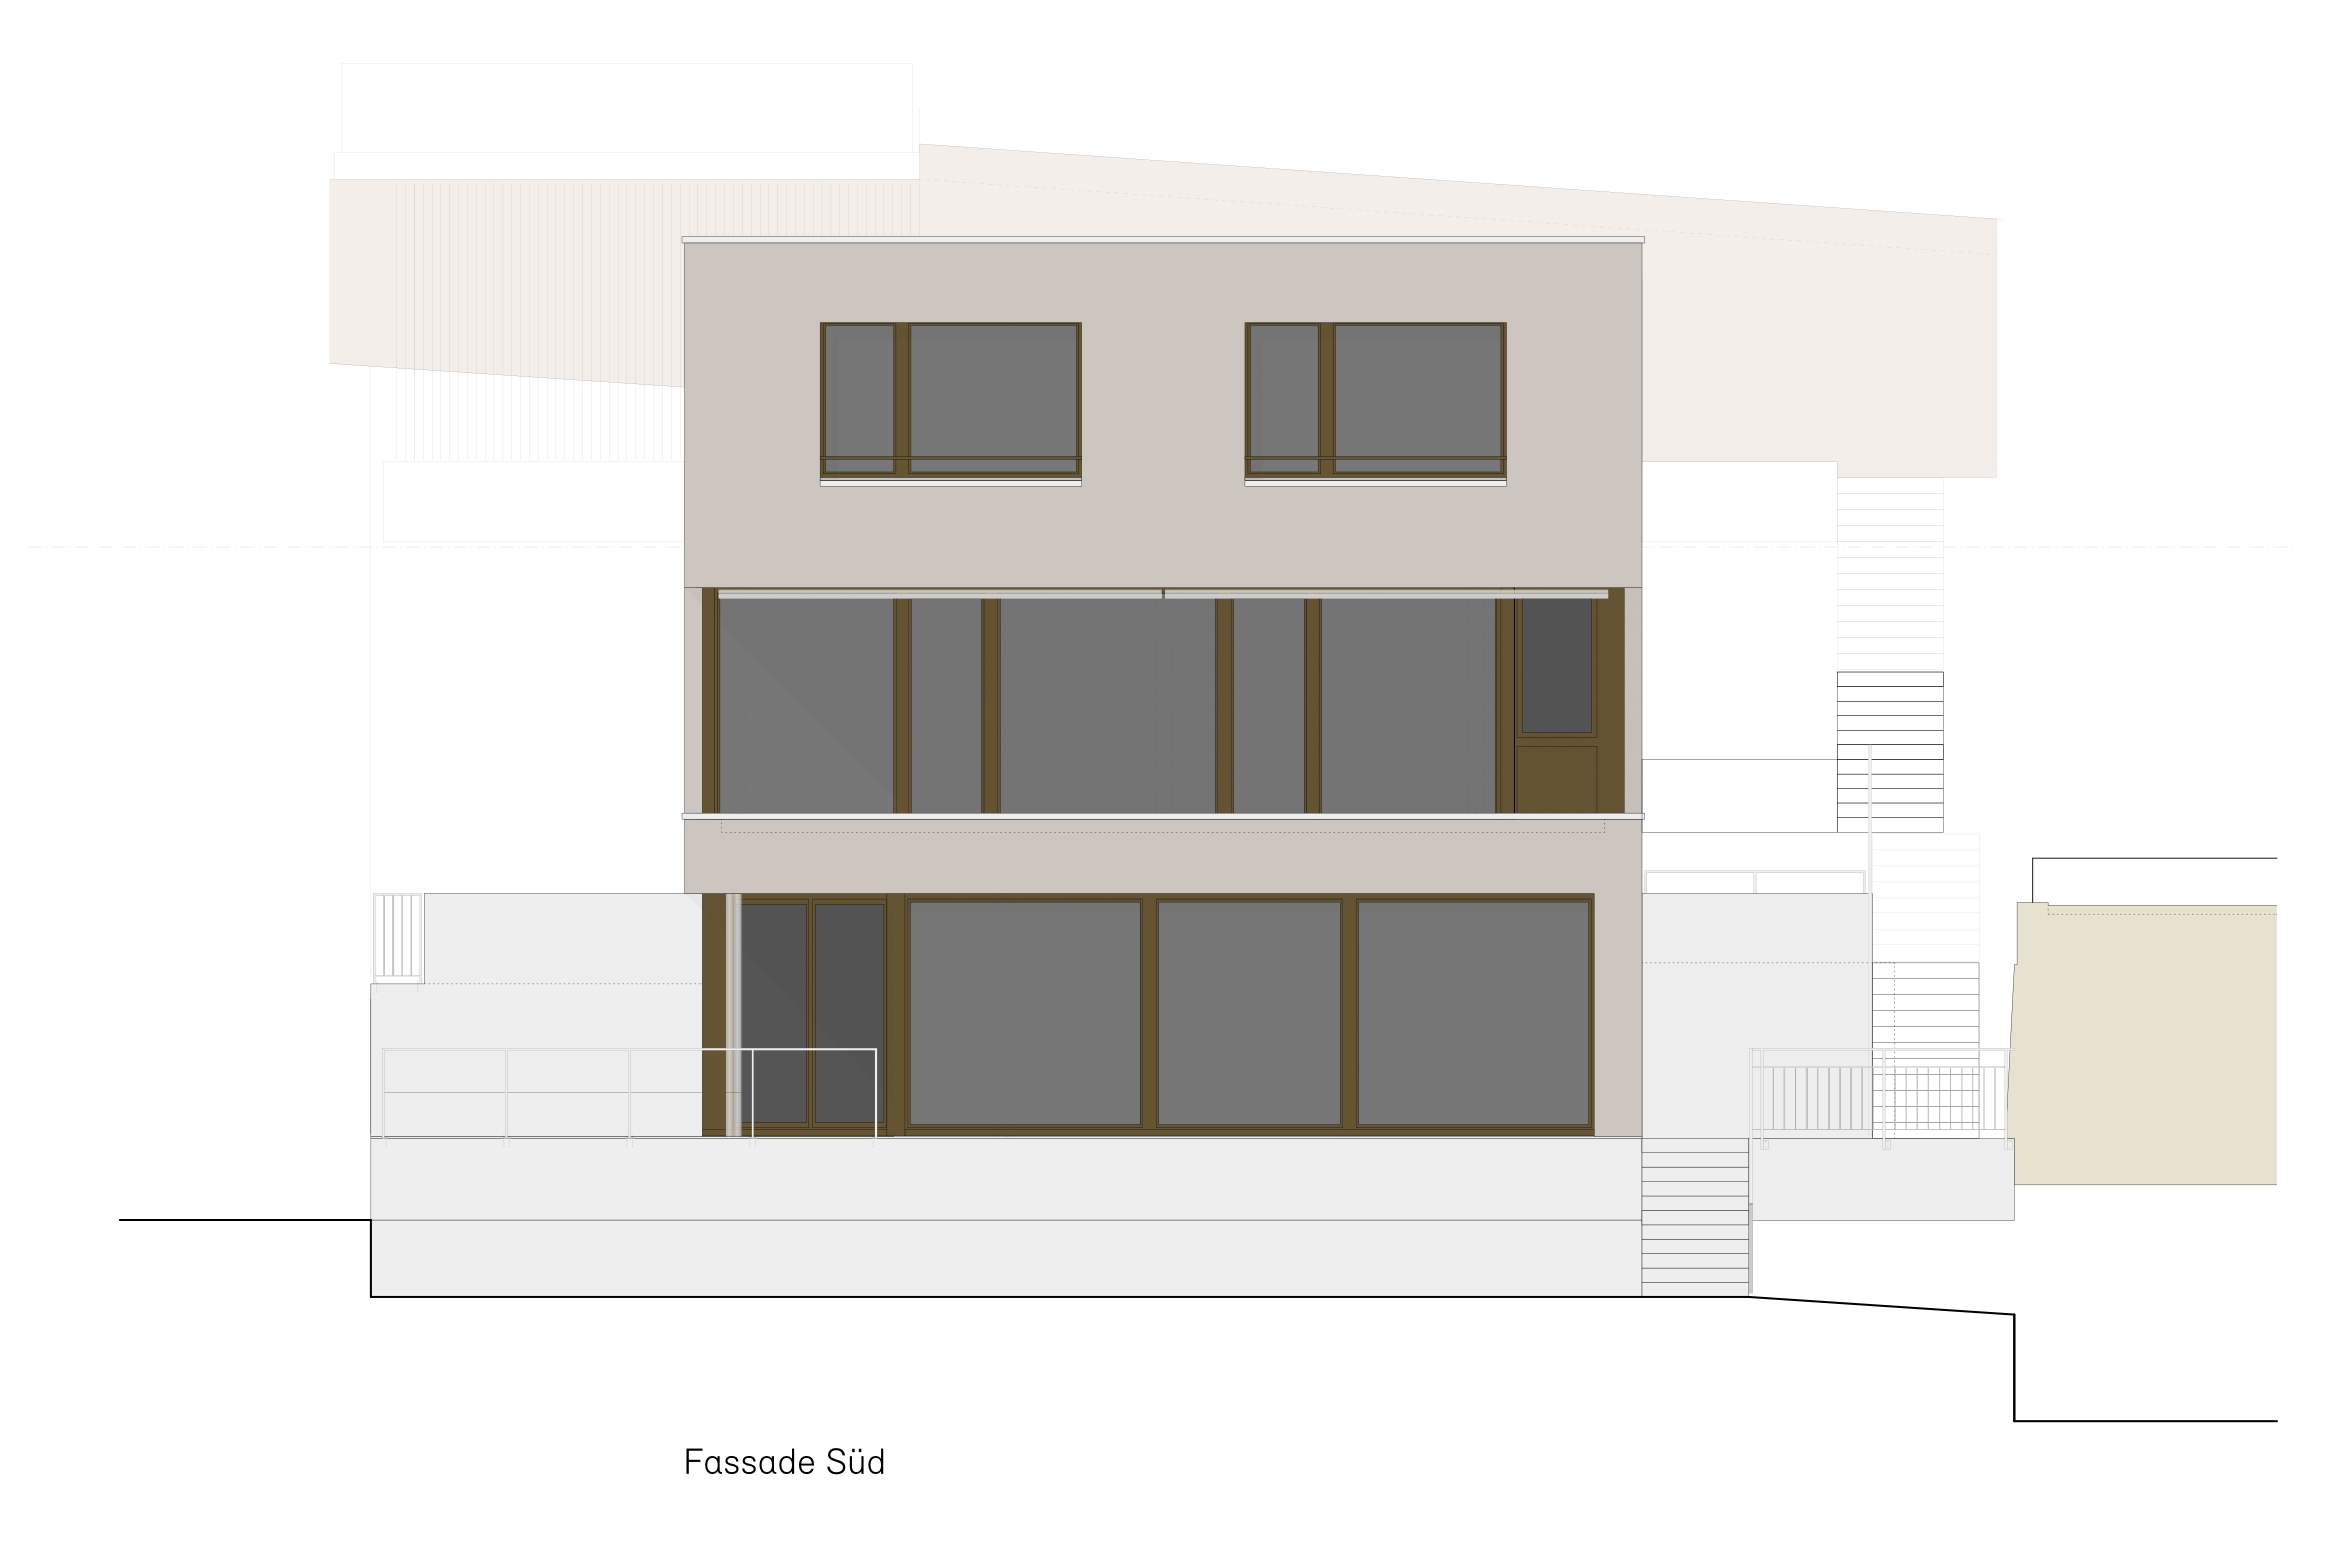 324 5 Fassade Süd